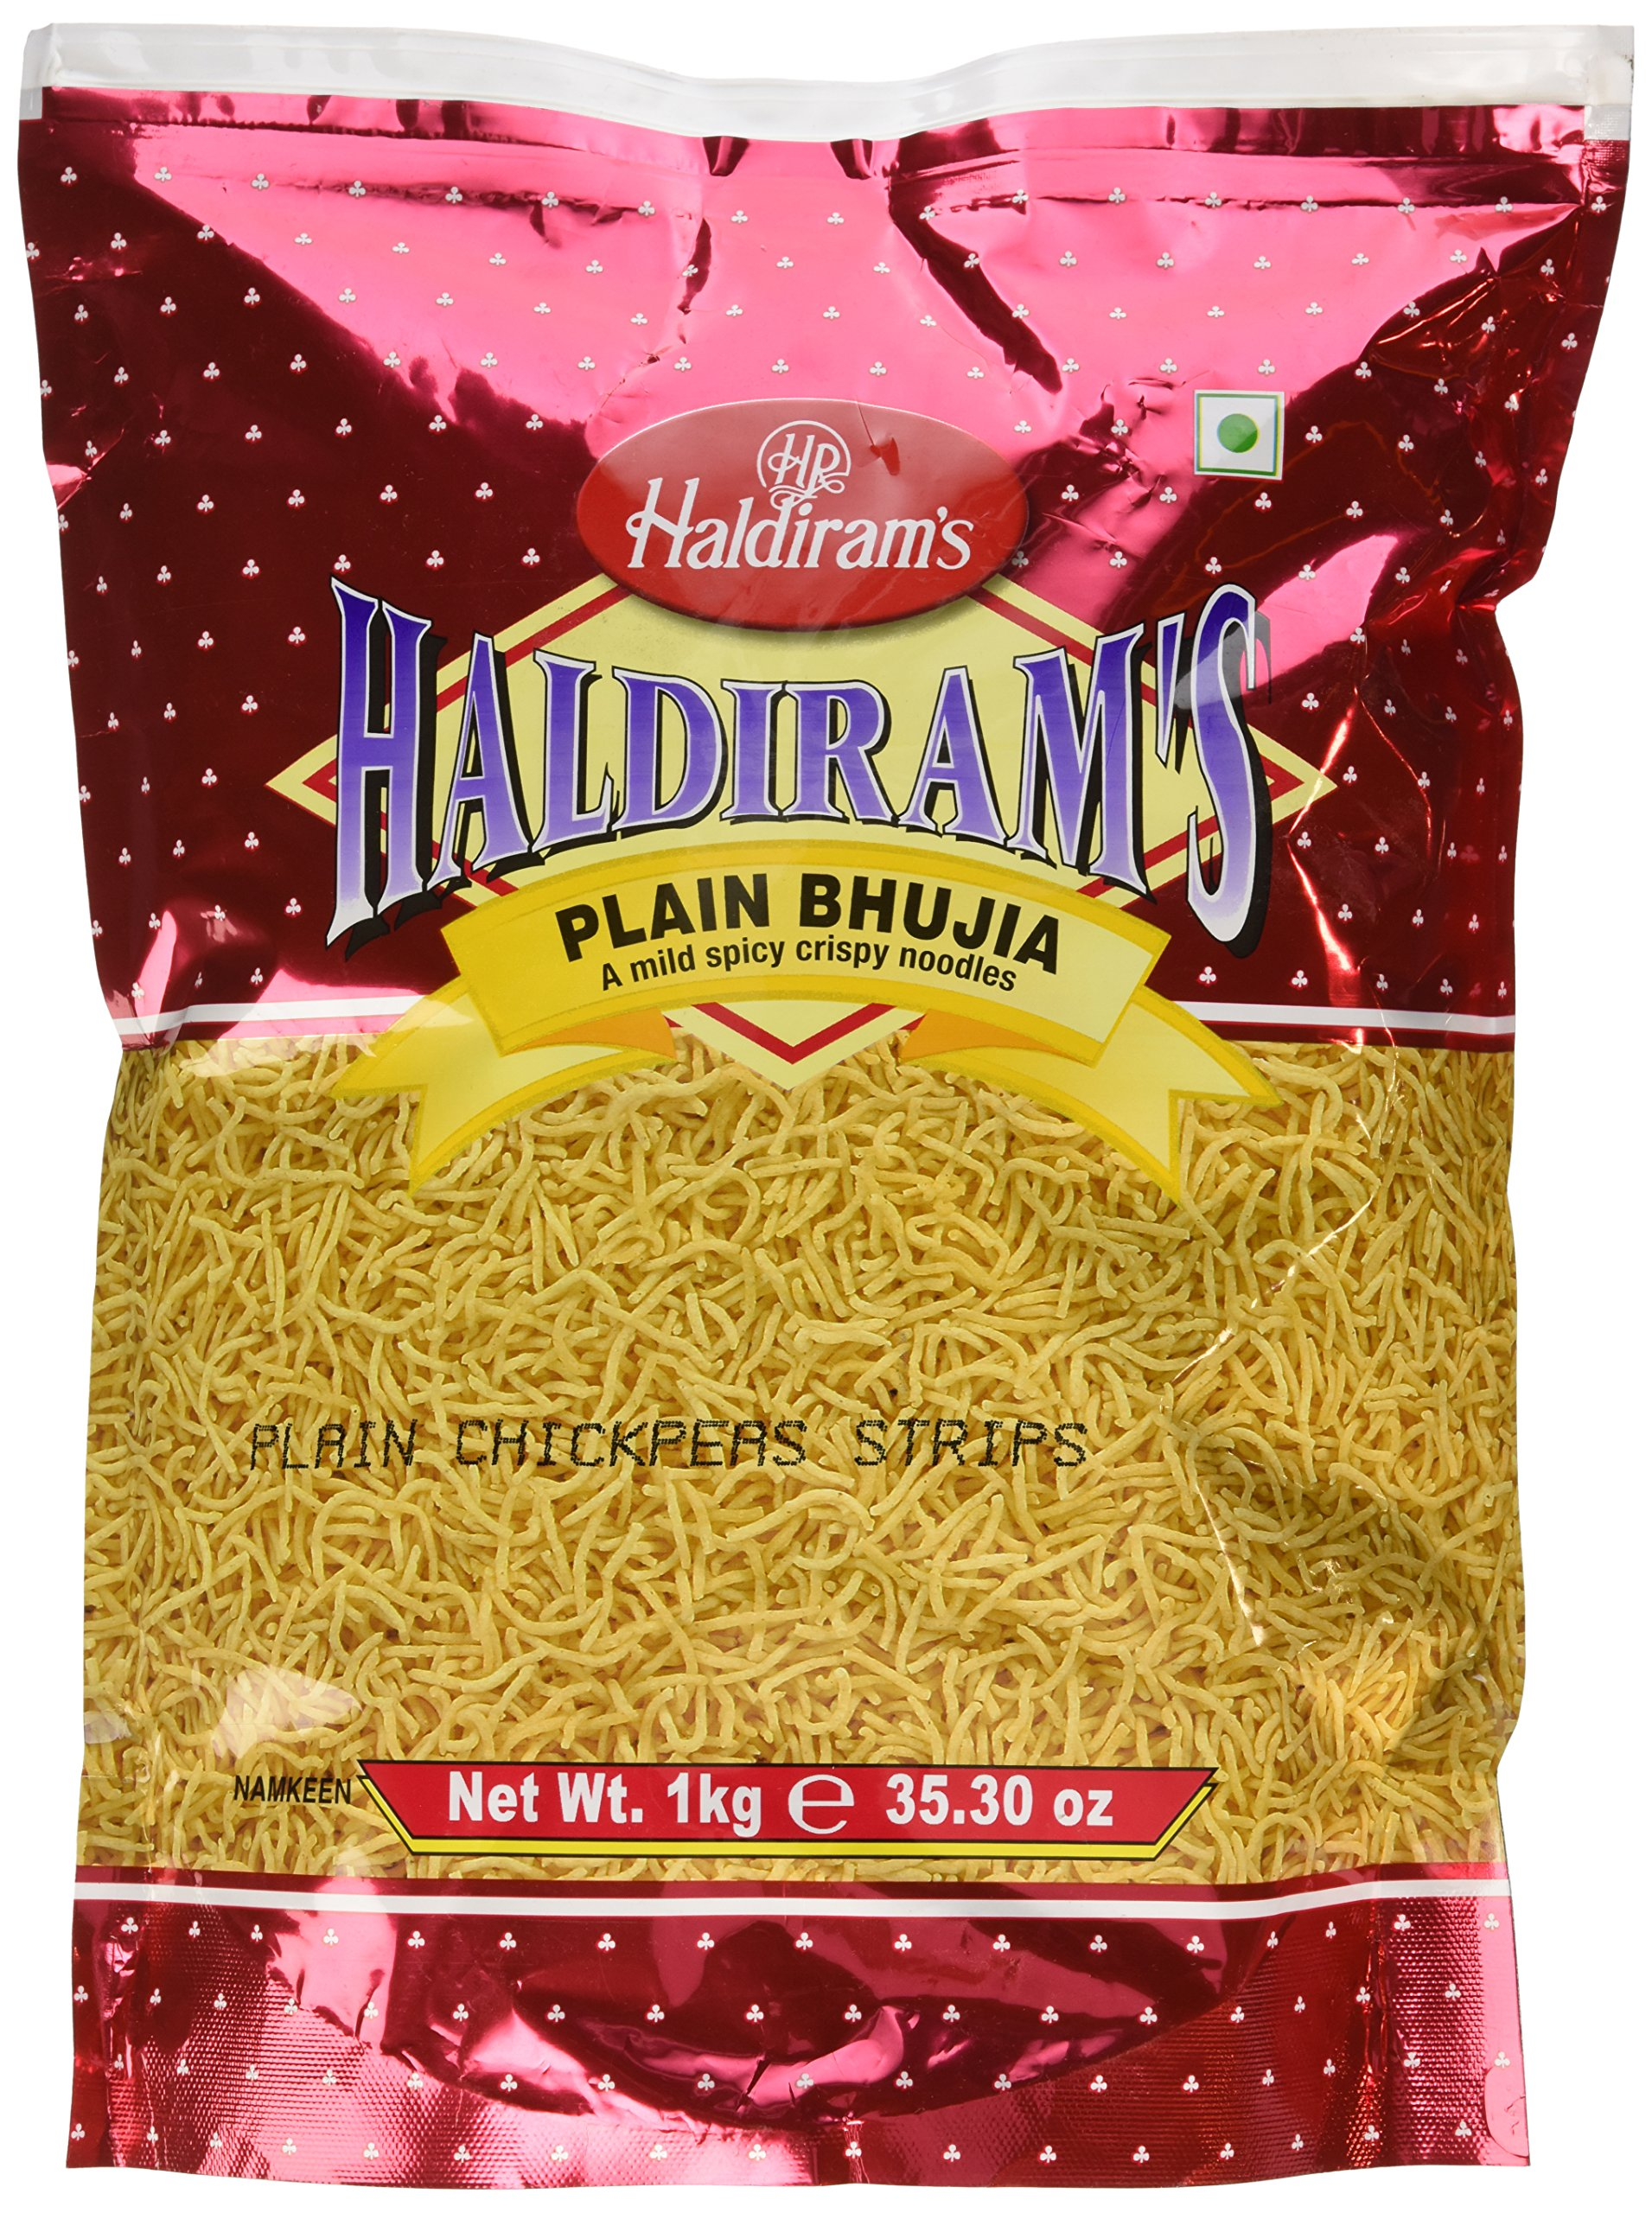 Haldiram's plain bhujia 35.30 oz by Haldiram